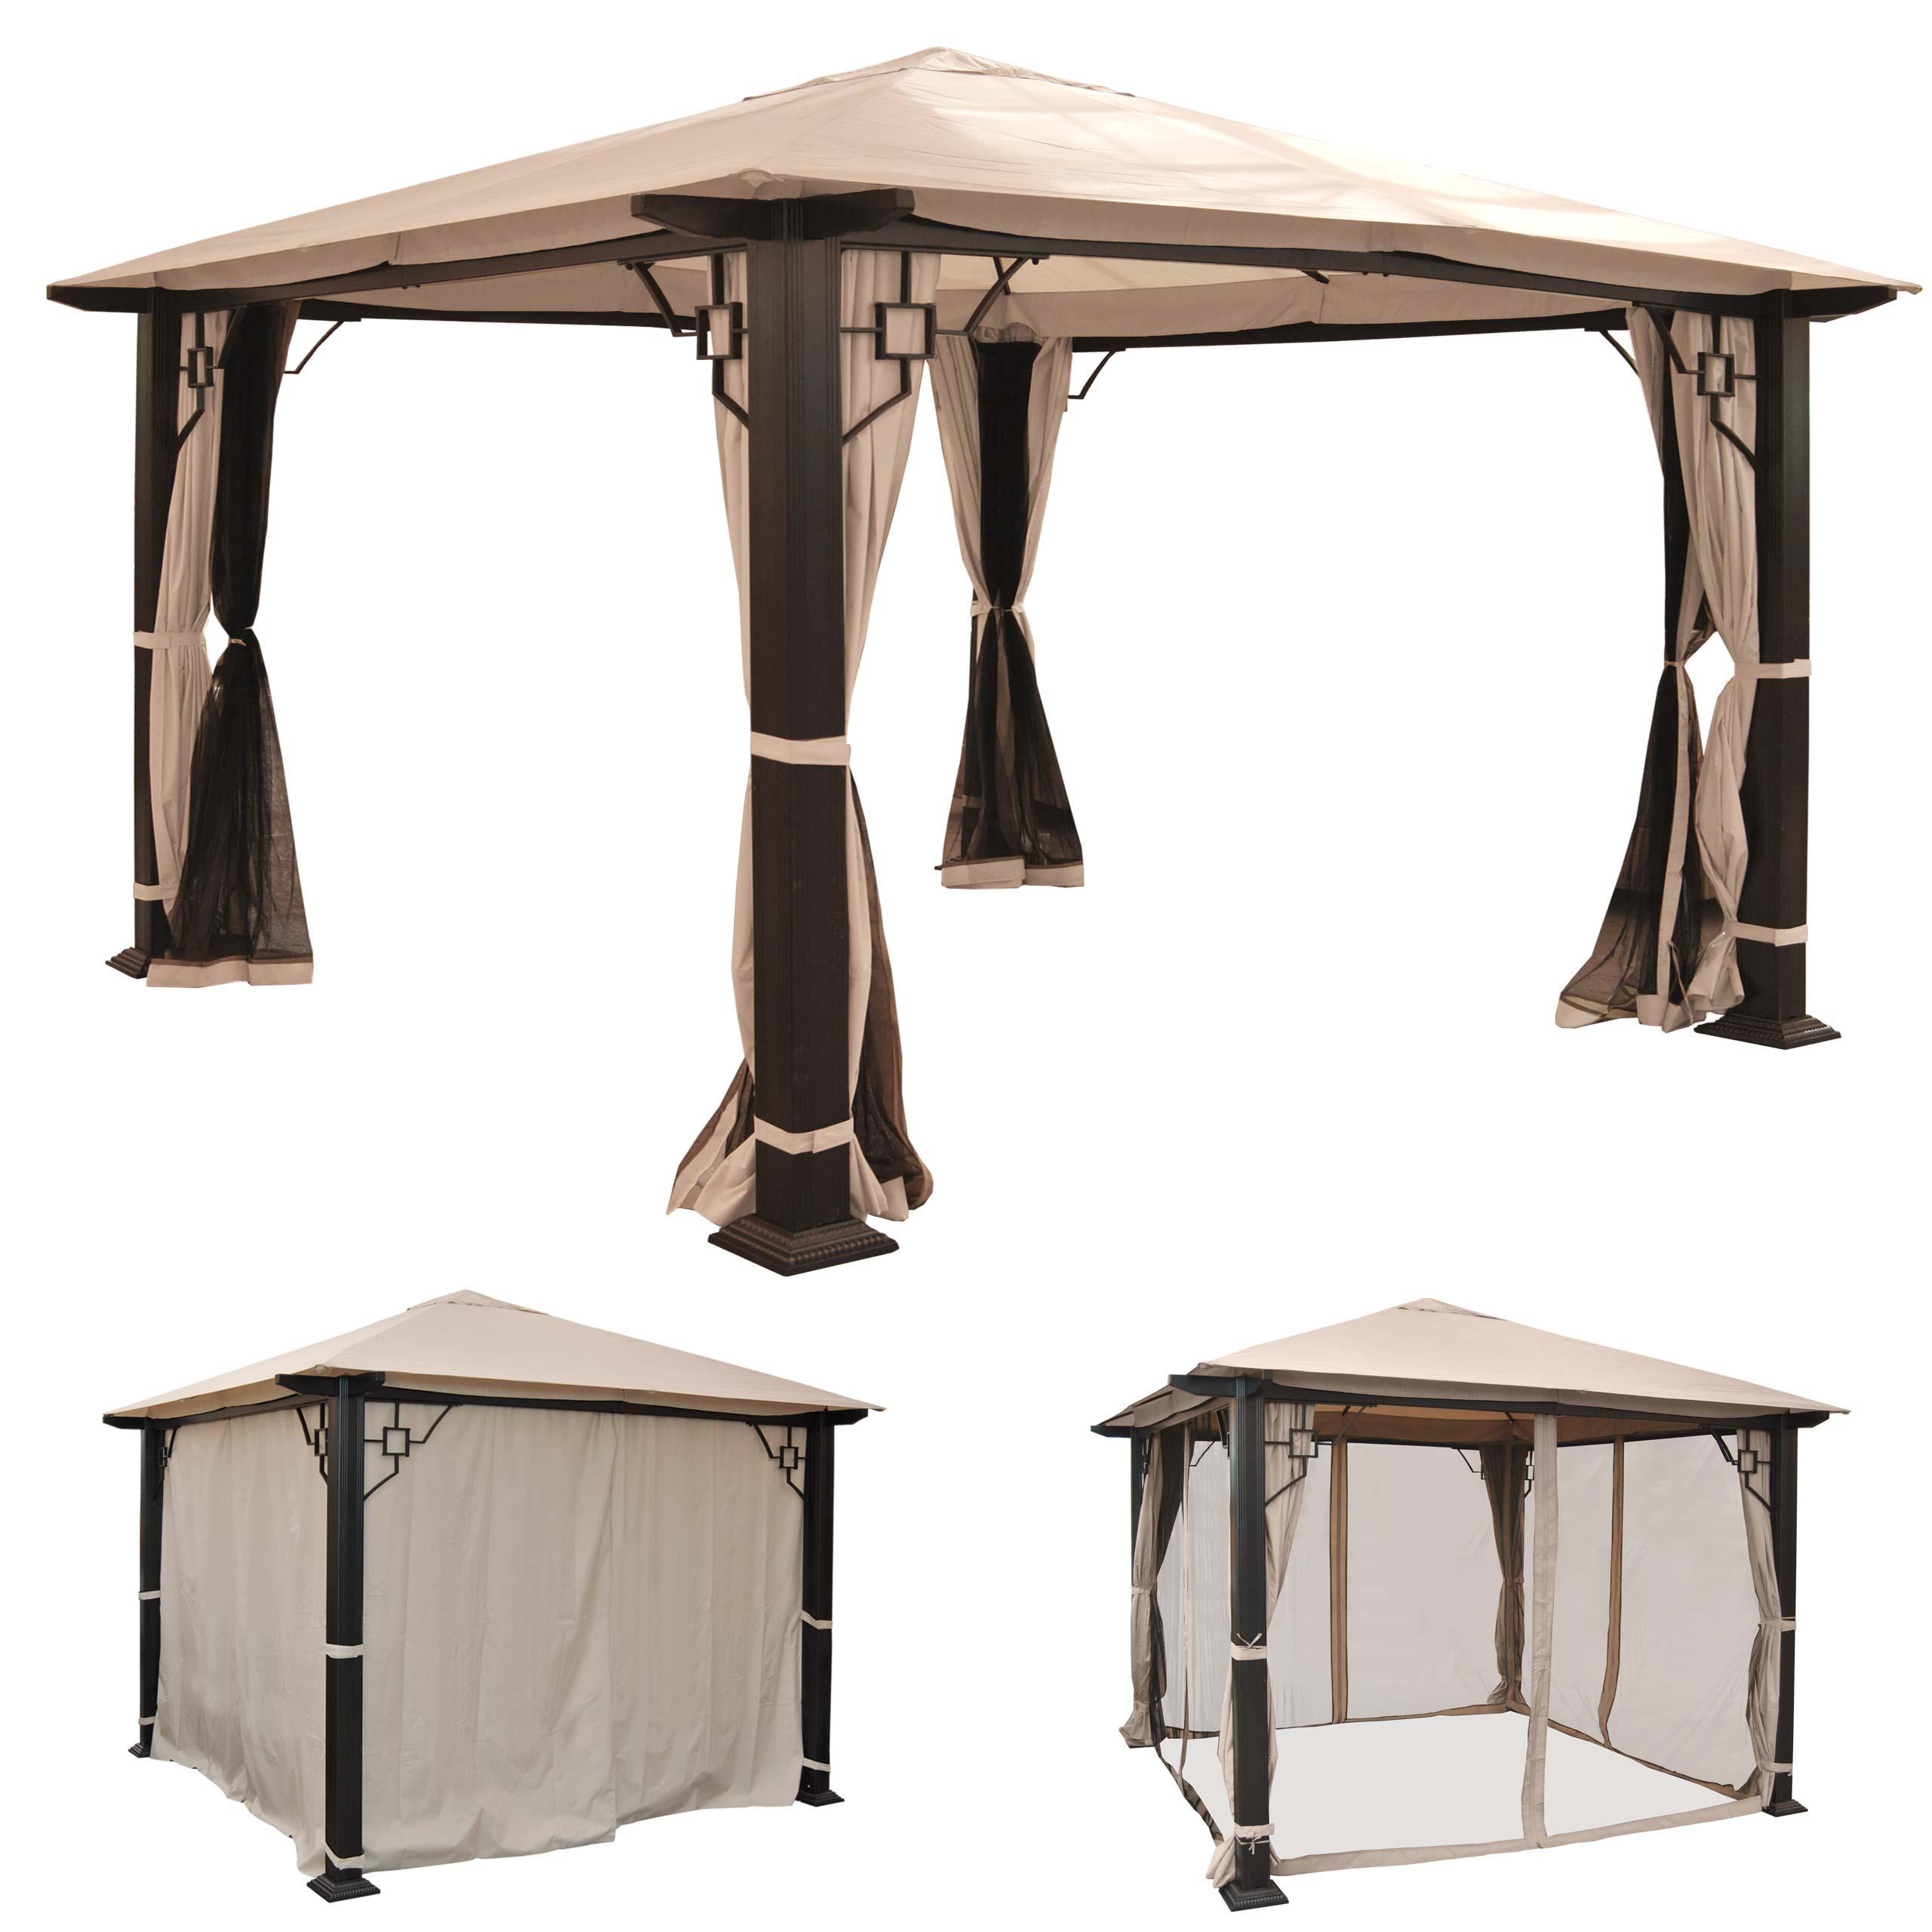 pergola mira garten pavillon 12cm luxus alu gestell 3. Black Bedroom Furniture Sets. Home Design Ideas